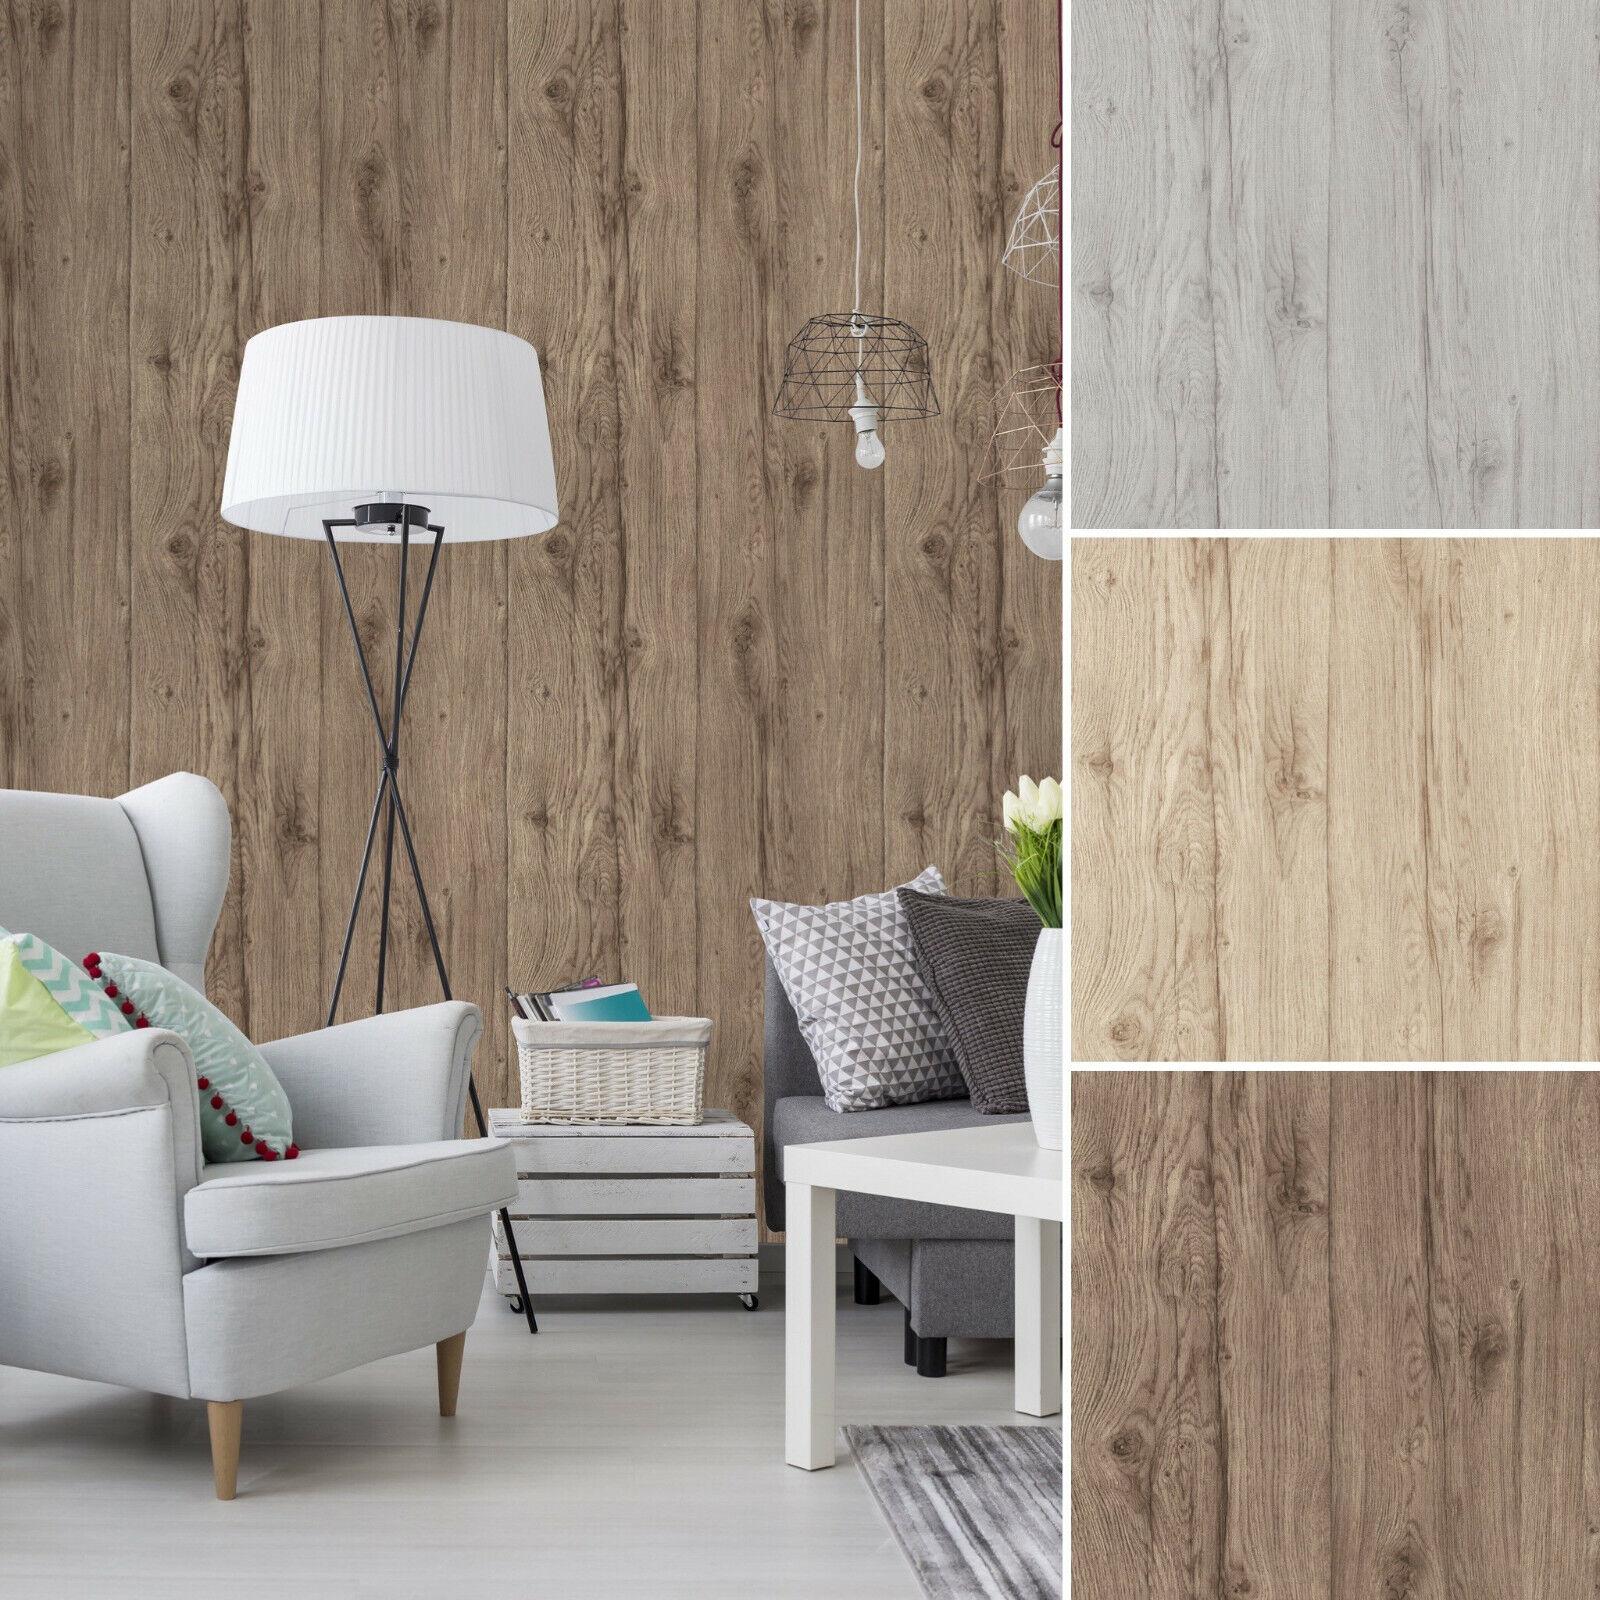 Vlies Tapete Holz Struktur Rustikal Grau Beige Braun Shabby Wood Landhaus Antik Ebay